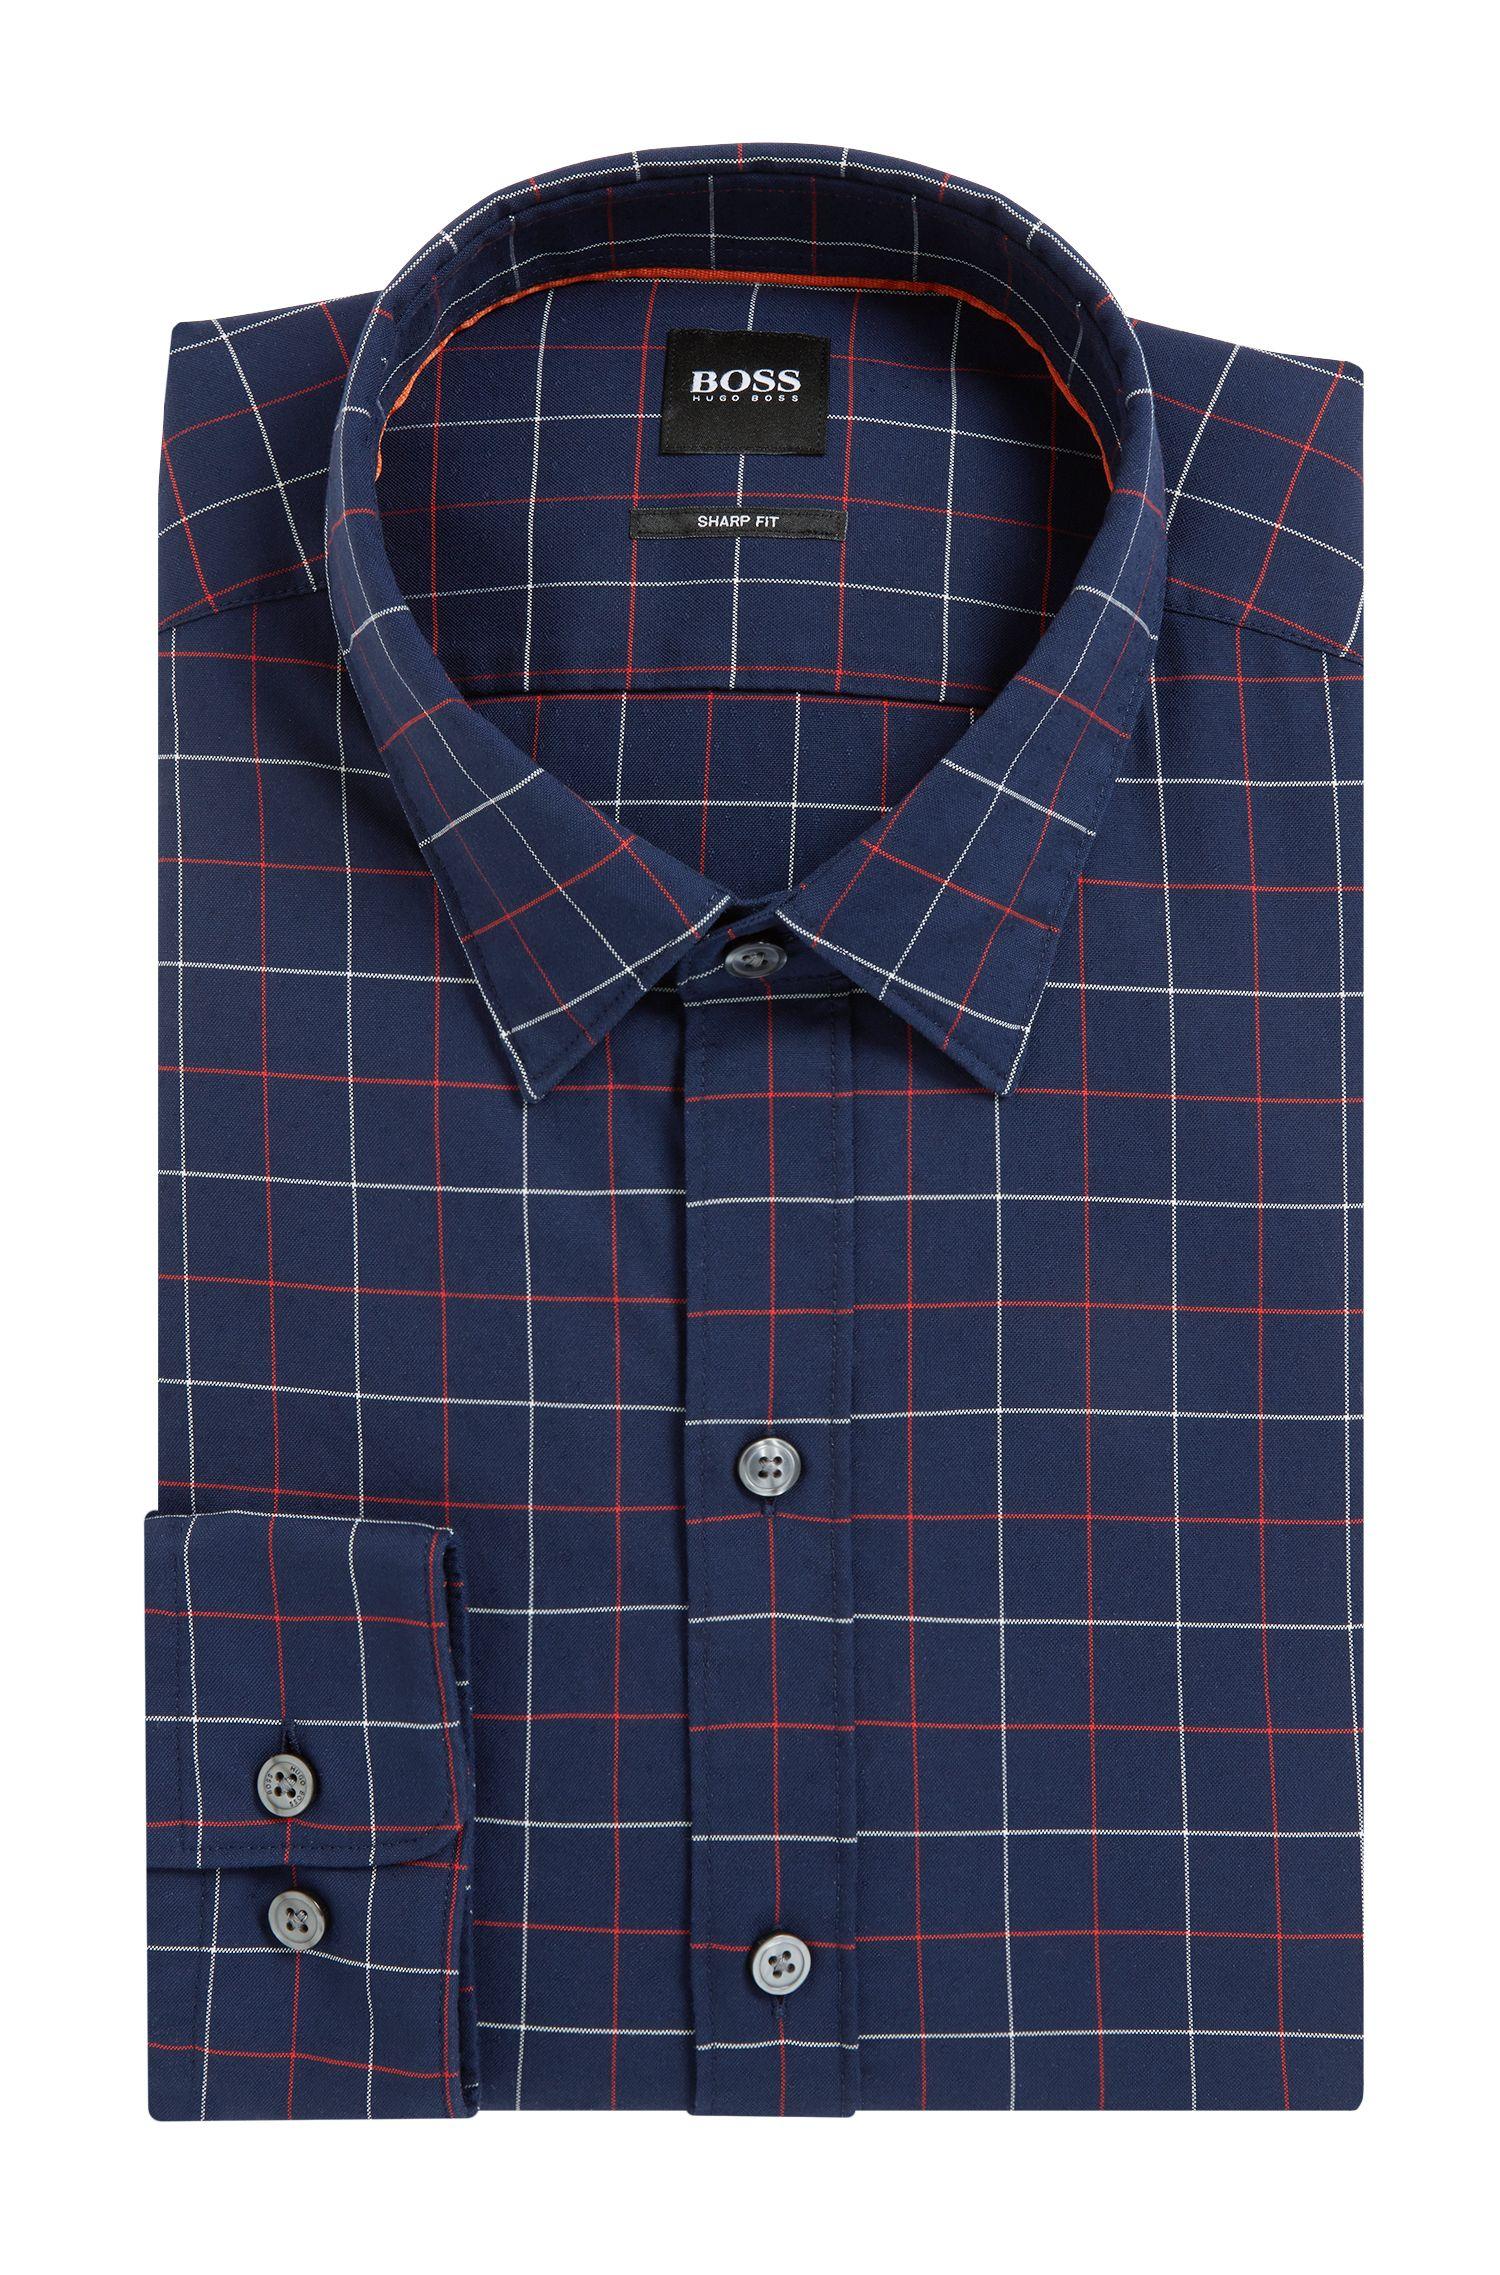 Plaid Cotton Sport Shirt, Sharp Fit  | Robbie